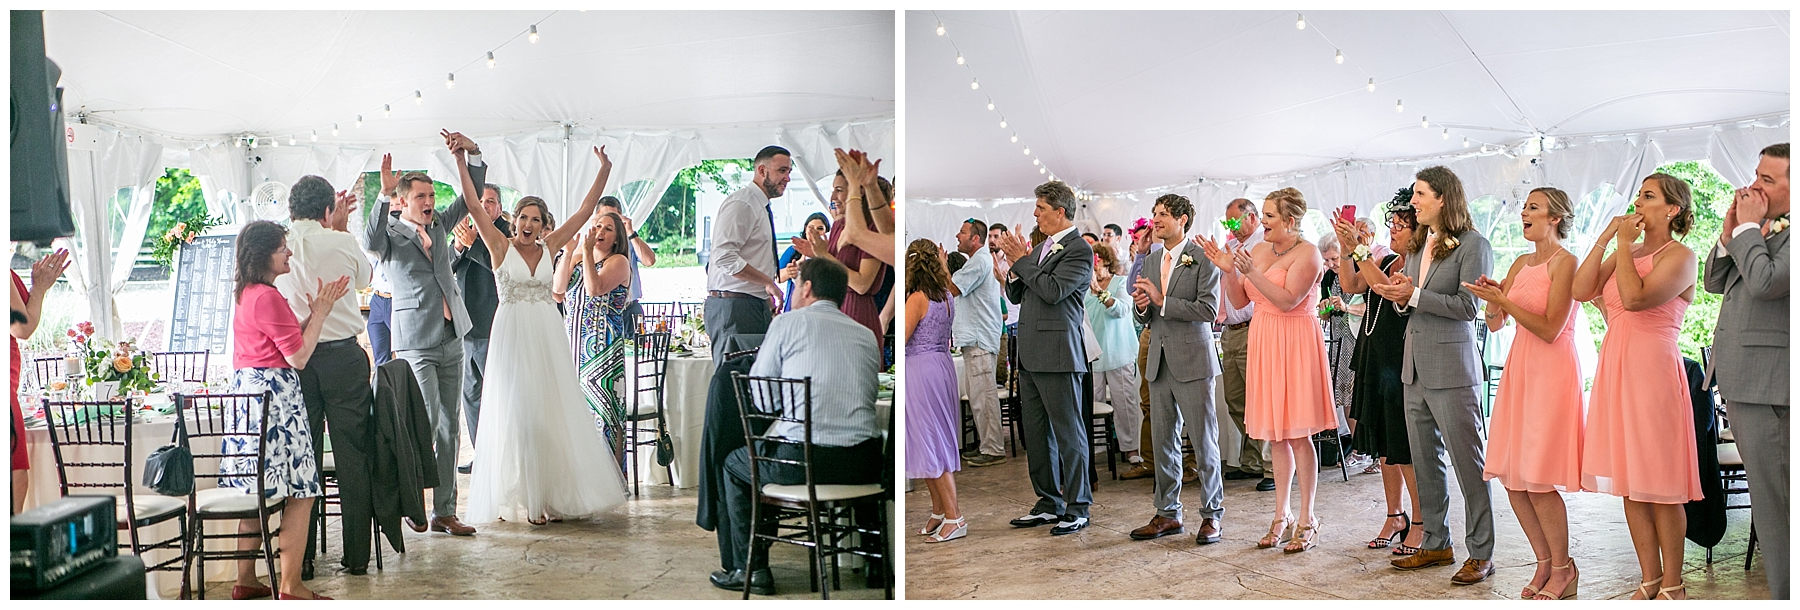 Chelsea Phil Bohemia River Overlook Wedding Living Radiant Photography photos_0129.jpg